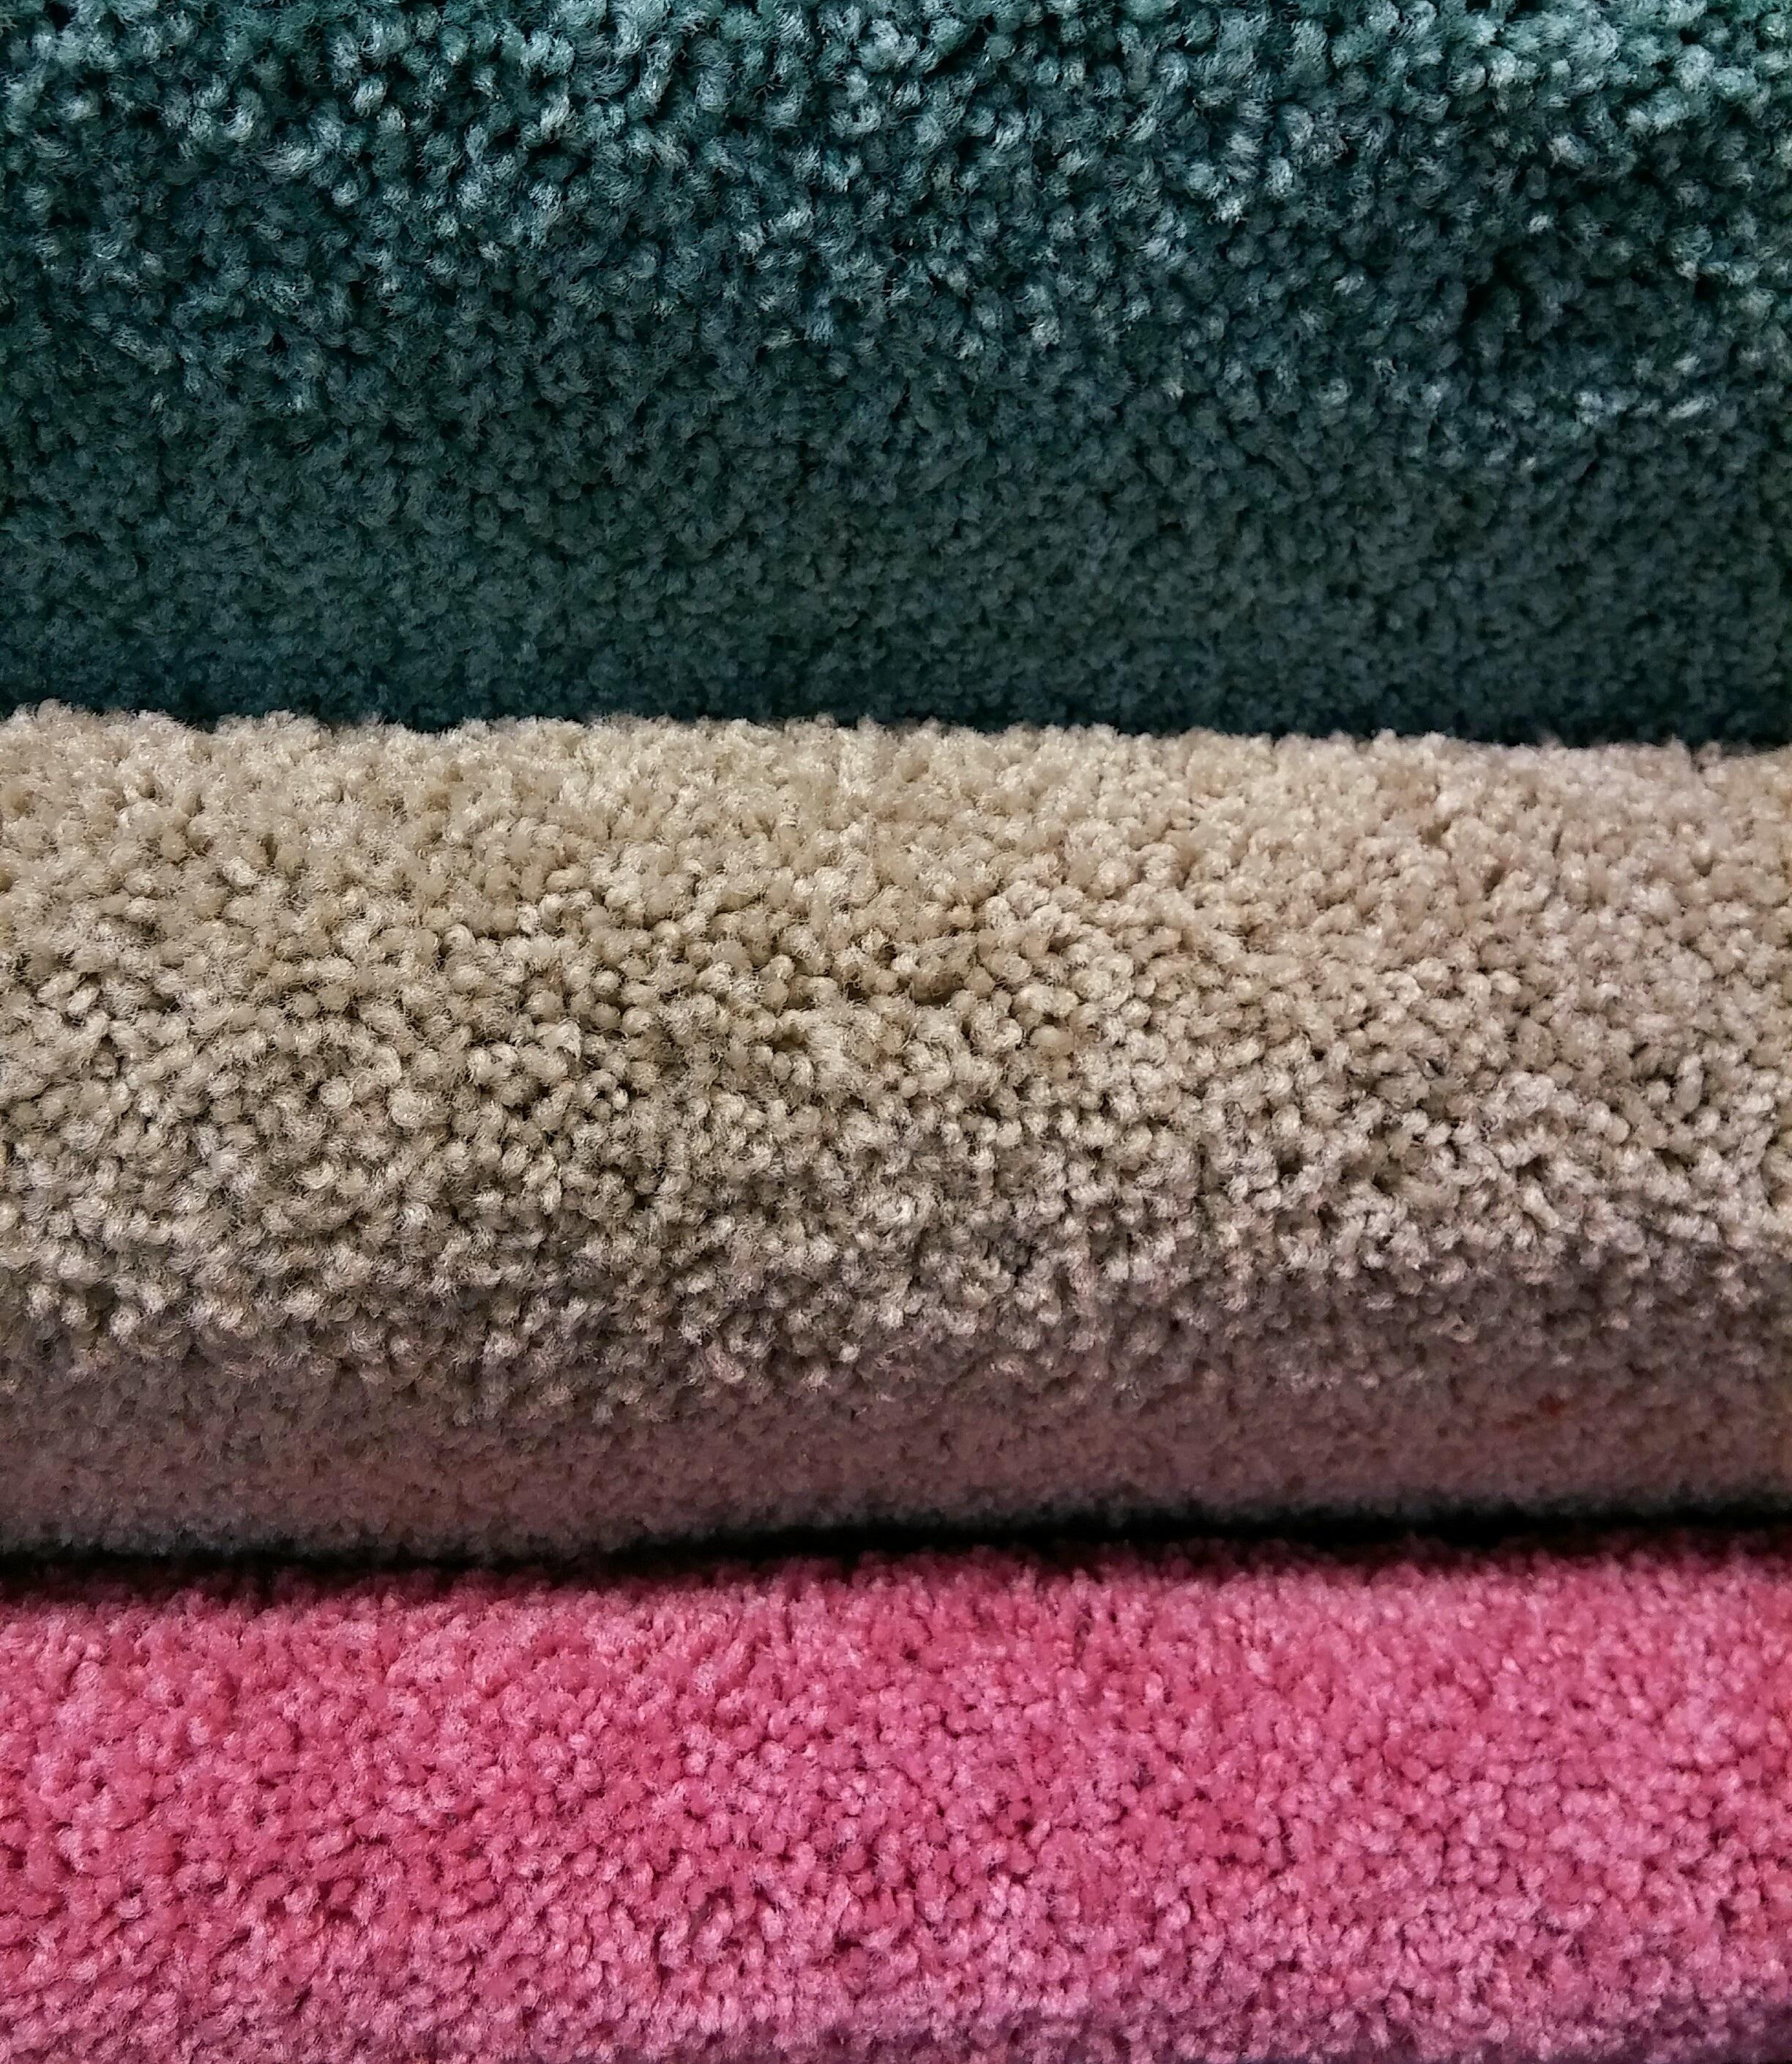 Free Images Texture Floor Asphalt Pile Rug Soil